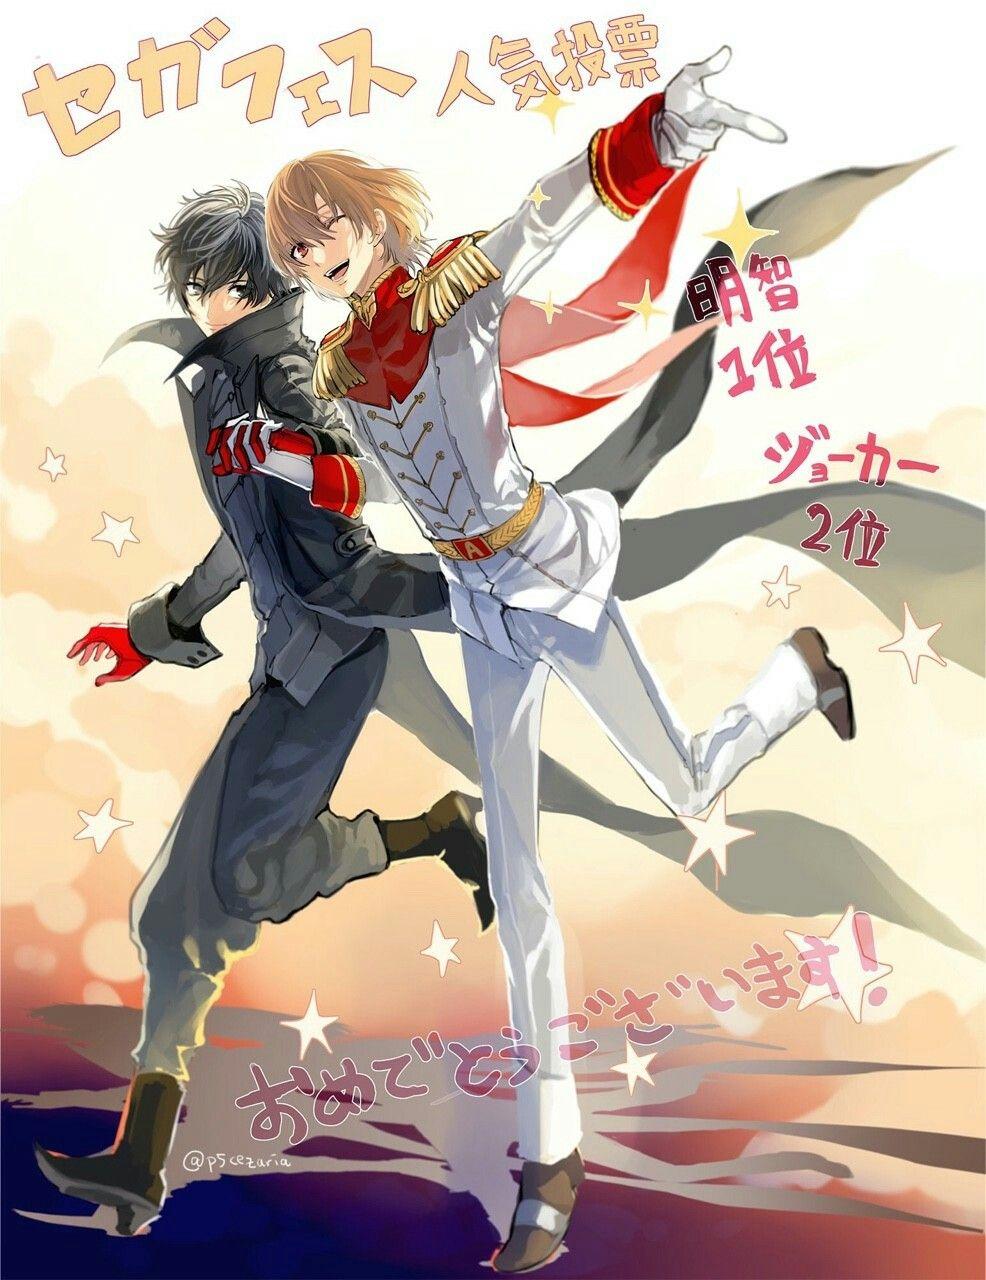 Akechi Goro And Akira Kurusu Persona 5 Anime Persona 5 Joker Persona 5 Cosplay